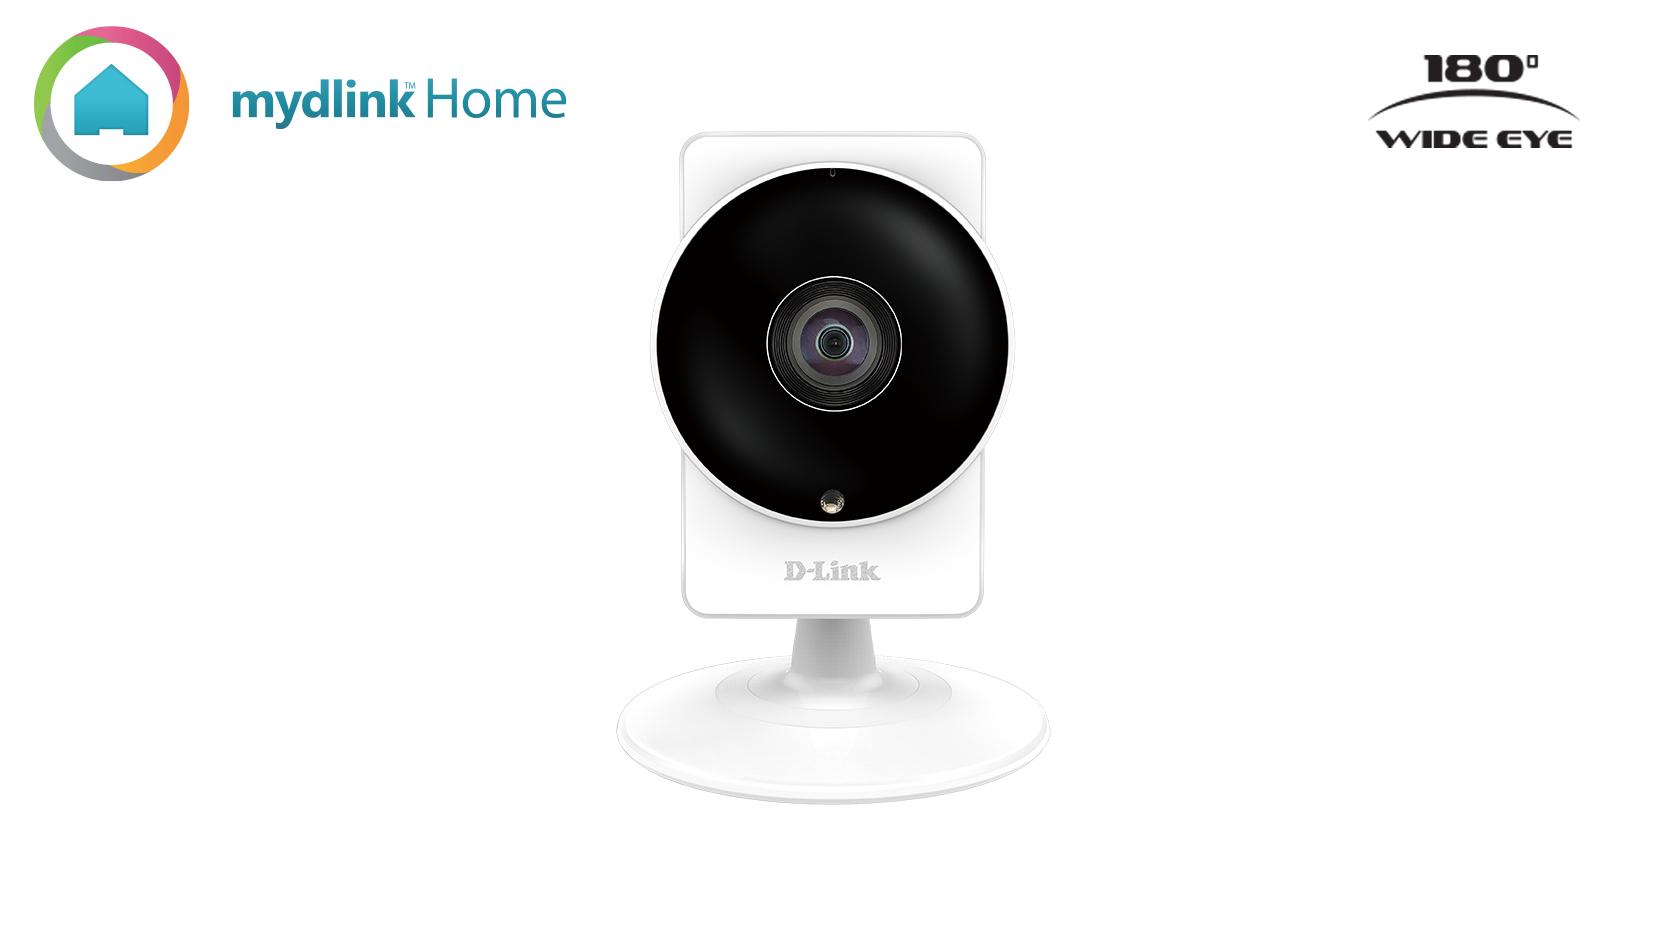 D-Link Mydlink Home Panoramic HD Camera - Netzwerk-Überwachungskamera - Farbe ( Tag&Nacht )